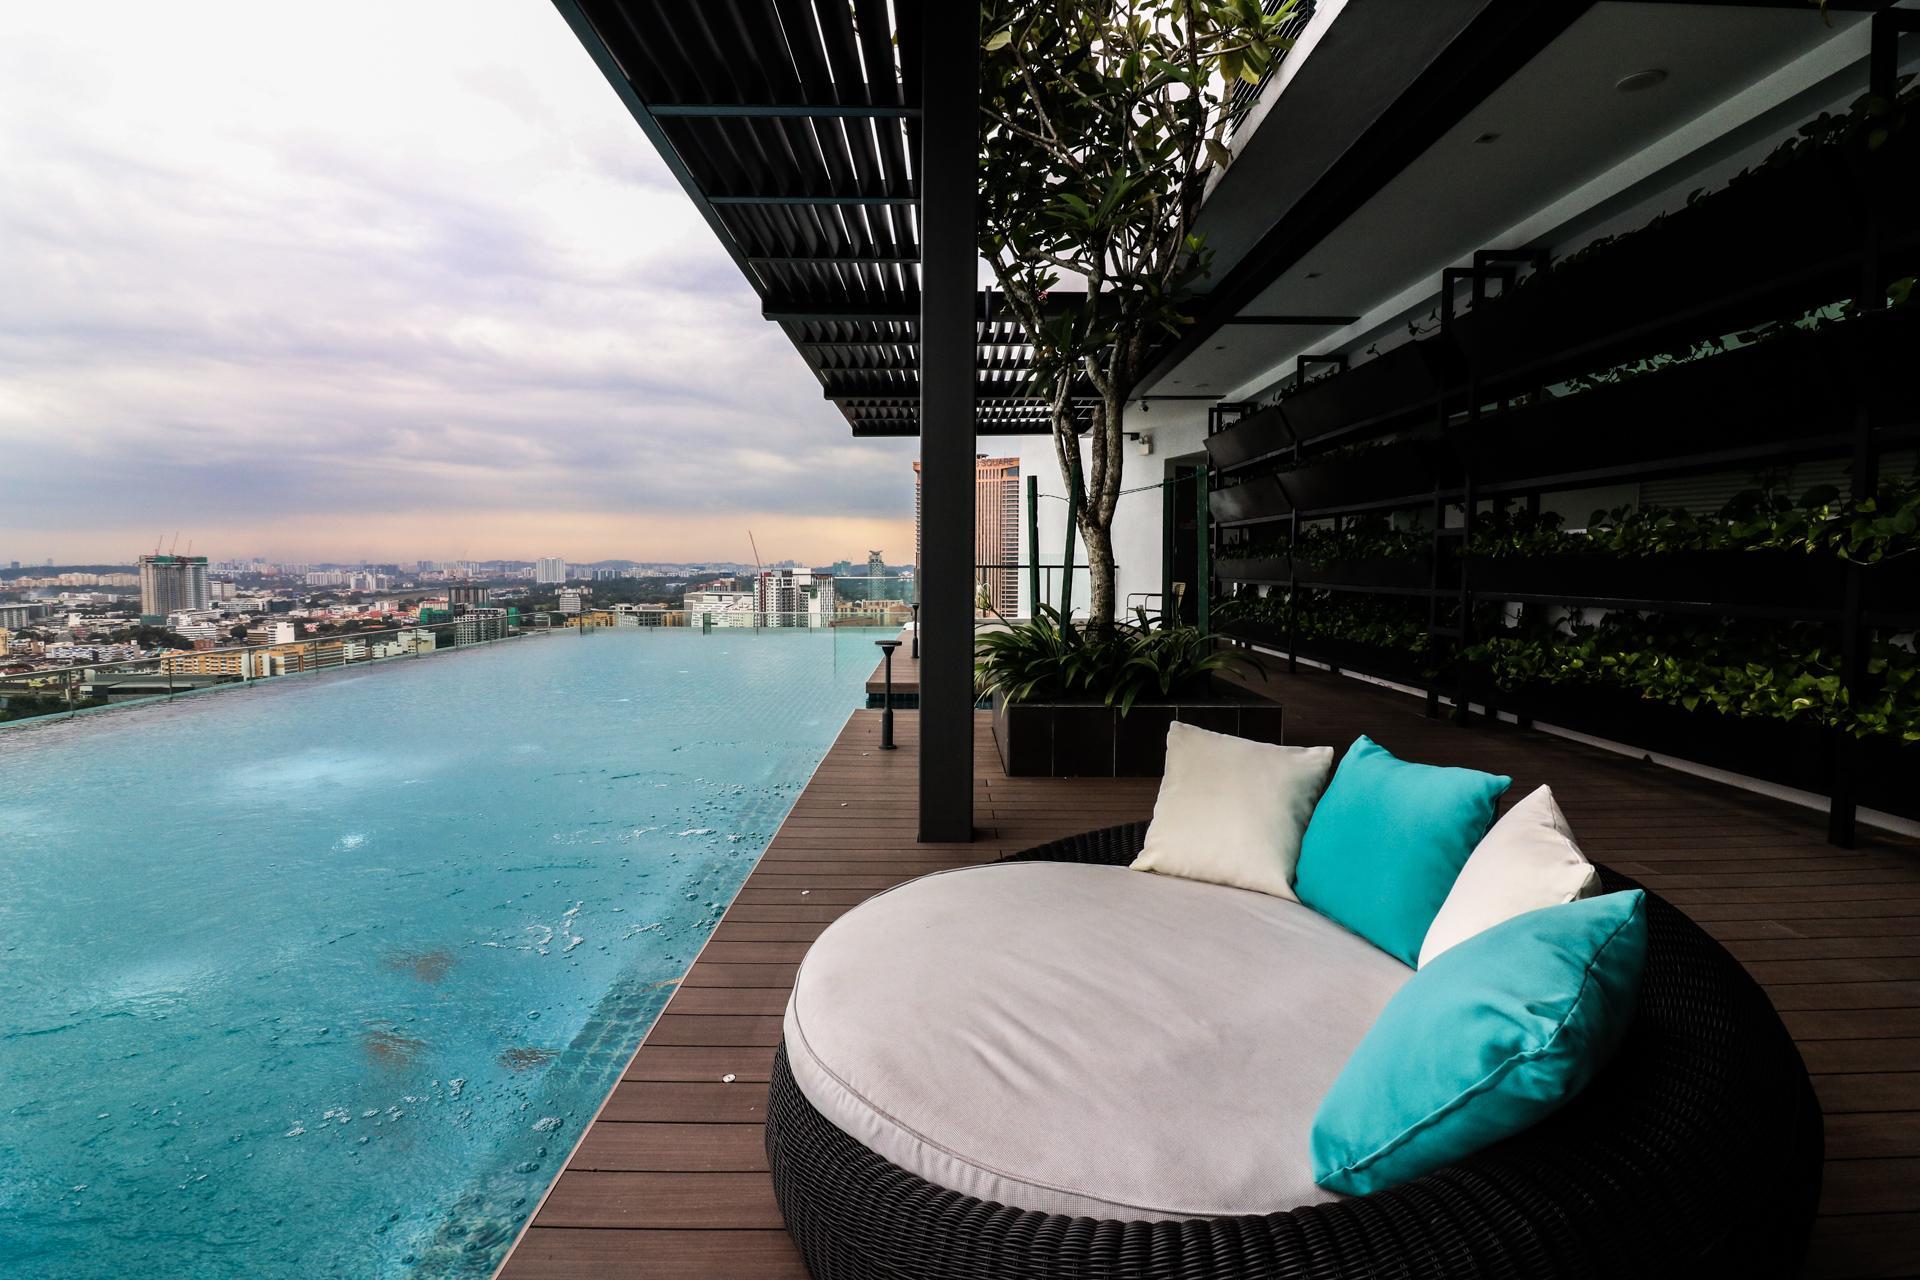 Victoria Home Bukit Bintang